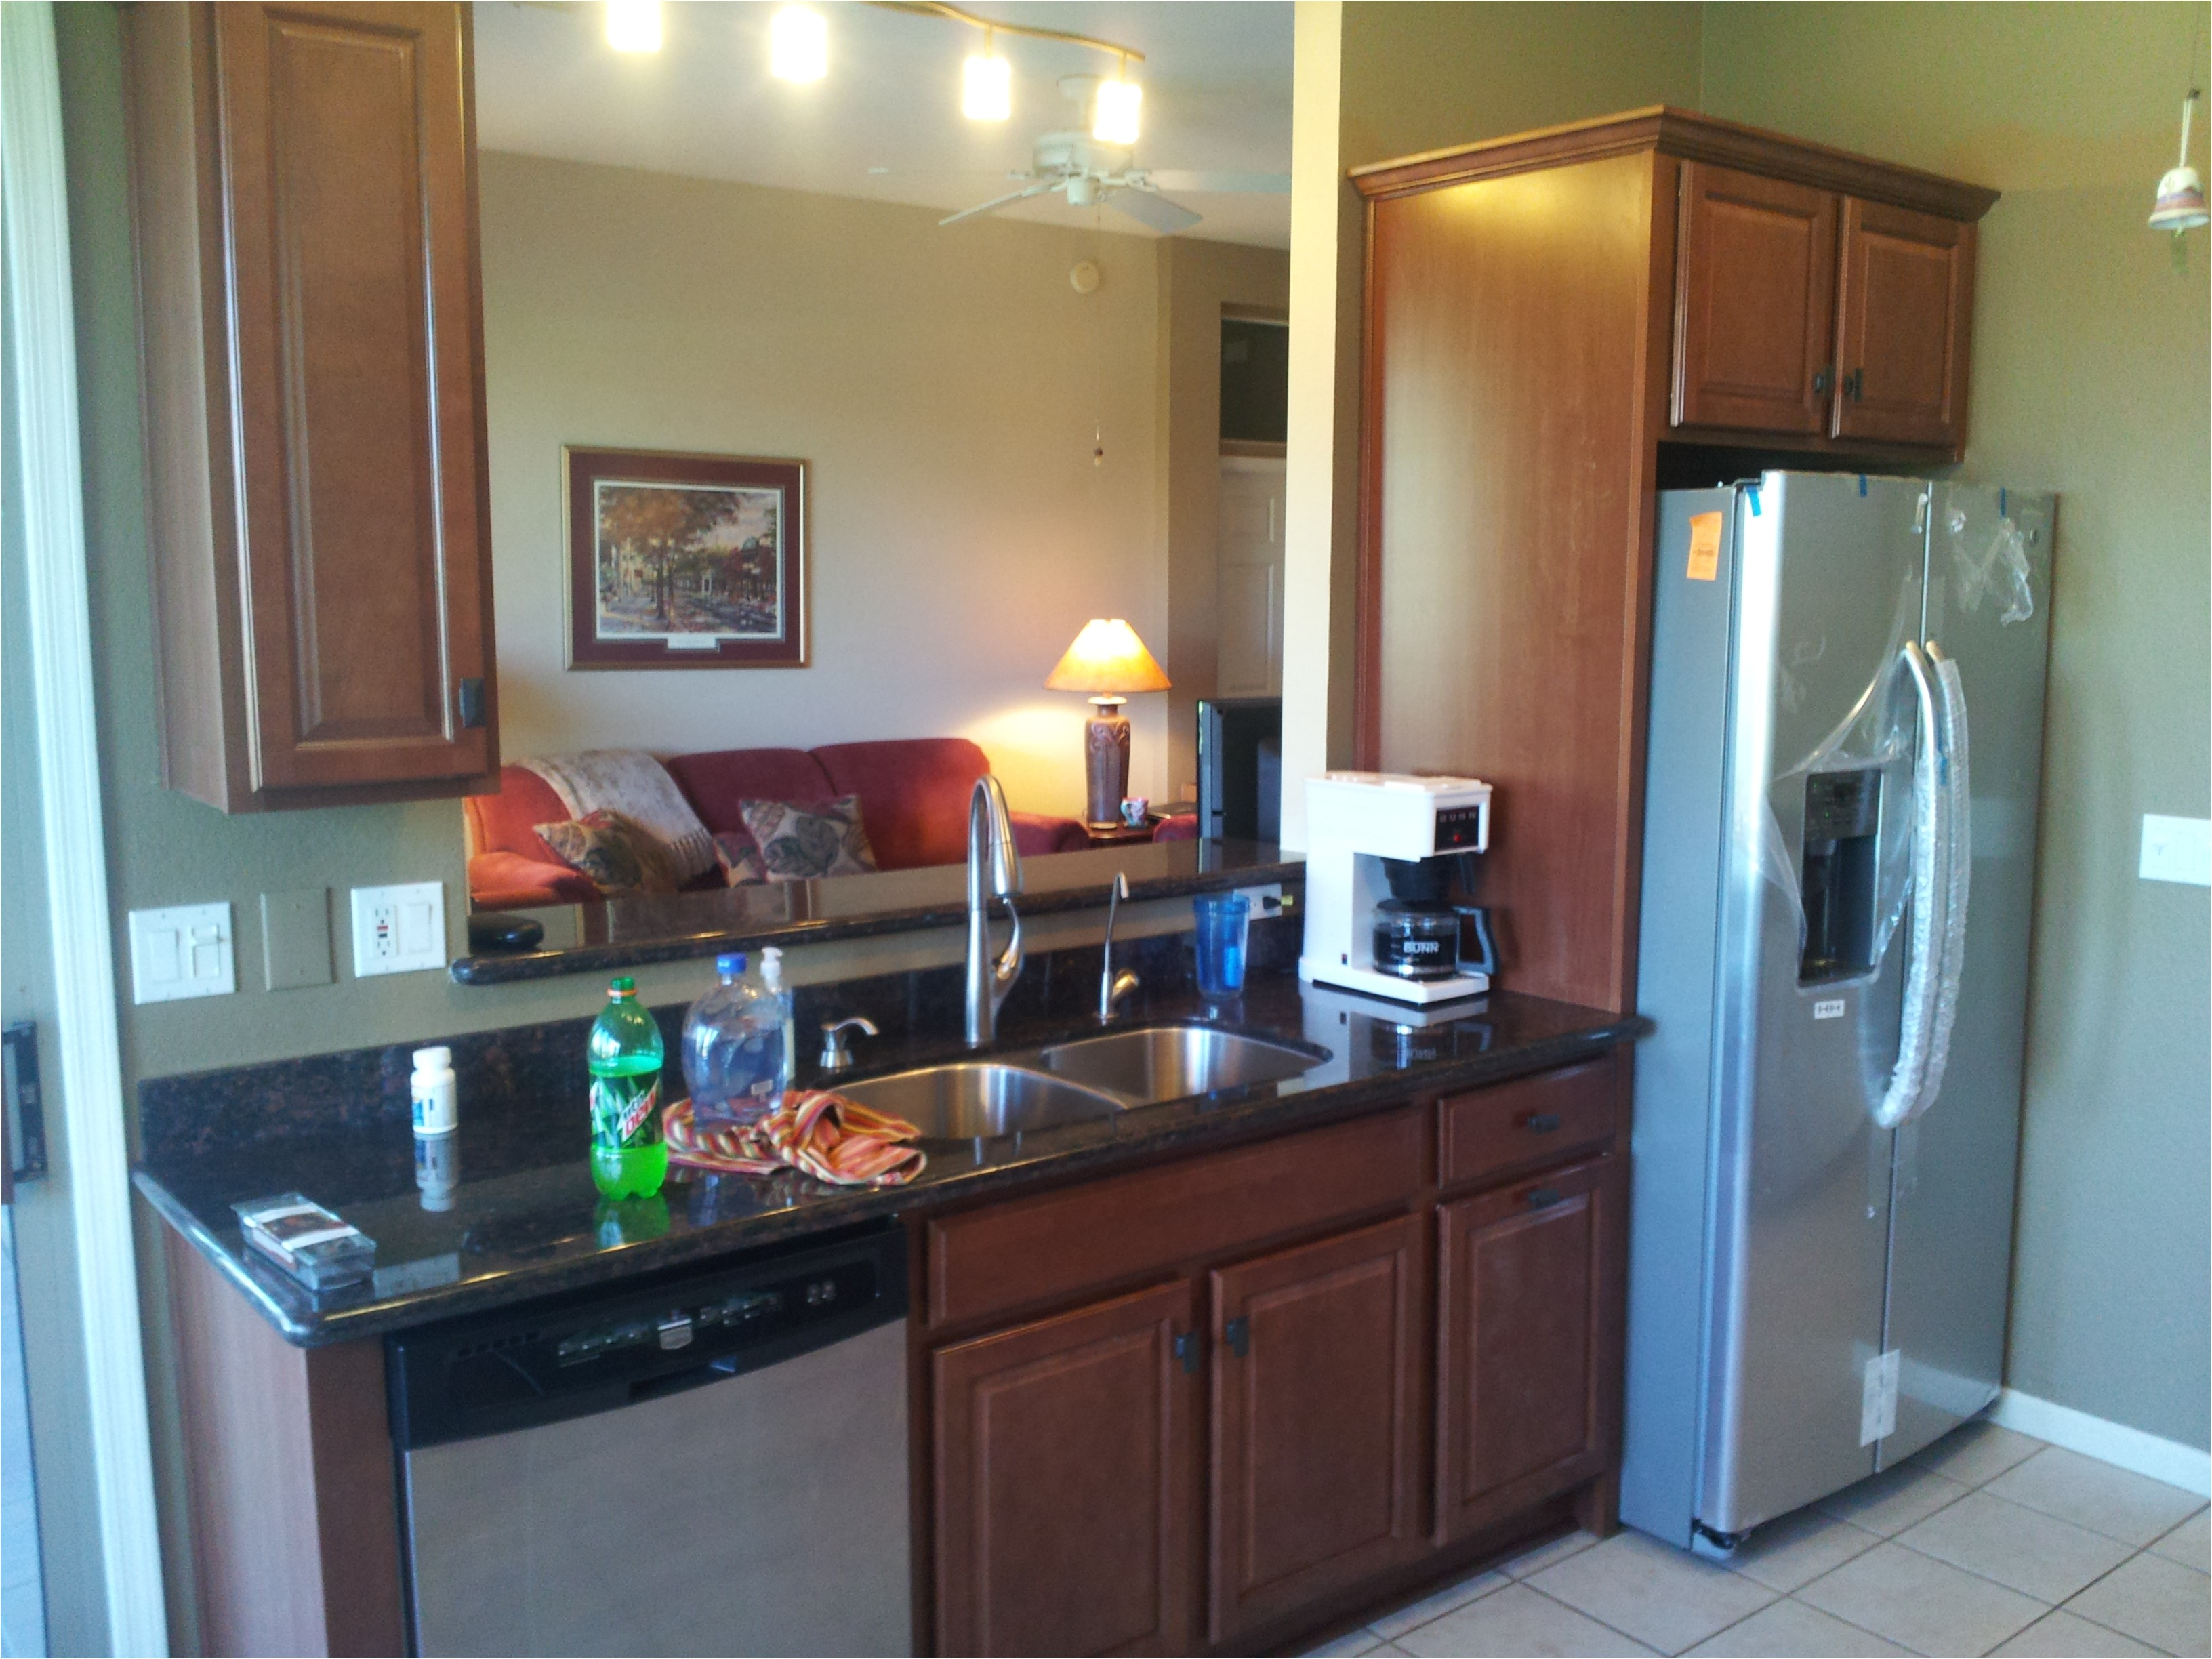 Aristokraft Cabinet Price List Aristokraft Cabinets Price List F55 About top Home Design Styles